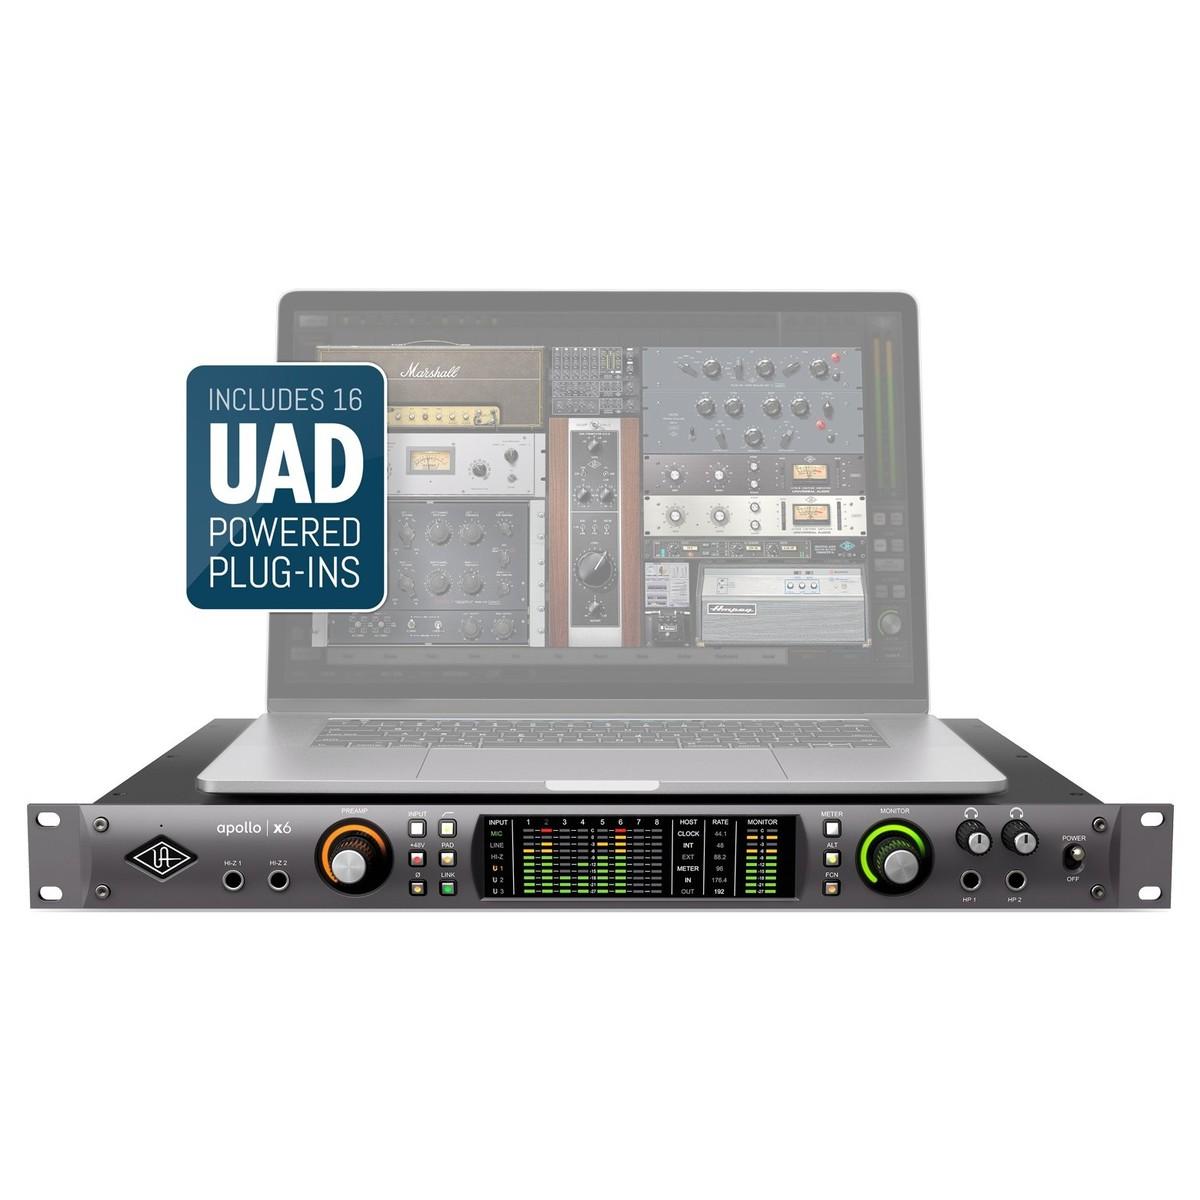 universal audio apollo x6 thunderbolt 3 audio interface at gear4music. Black Bedroom Furniture Sets. Home Design Ideas